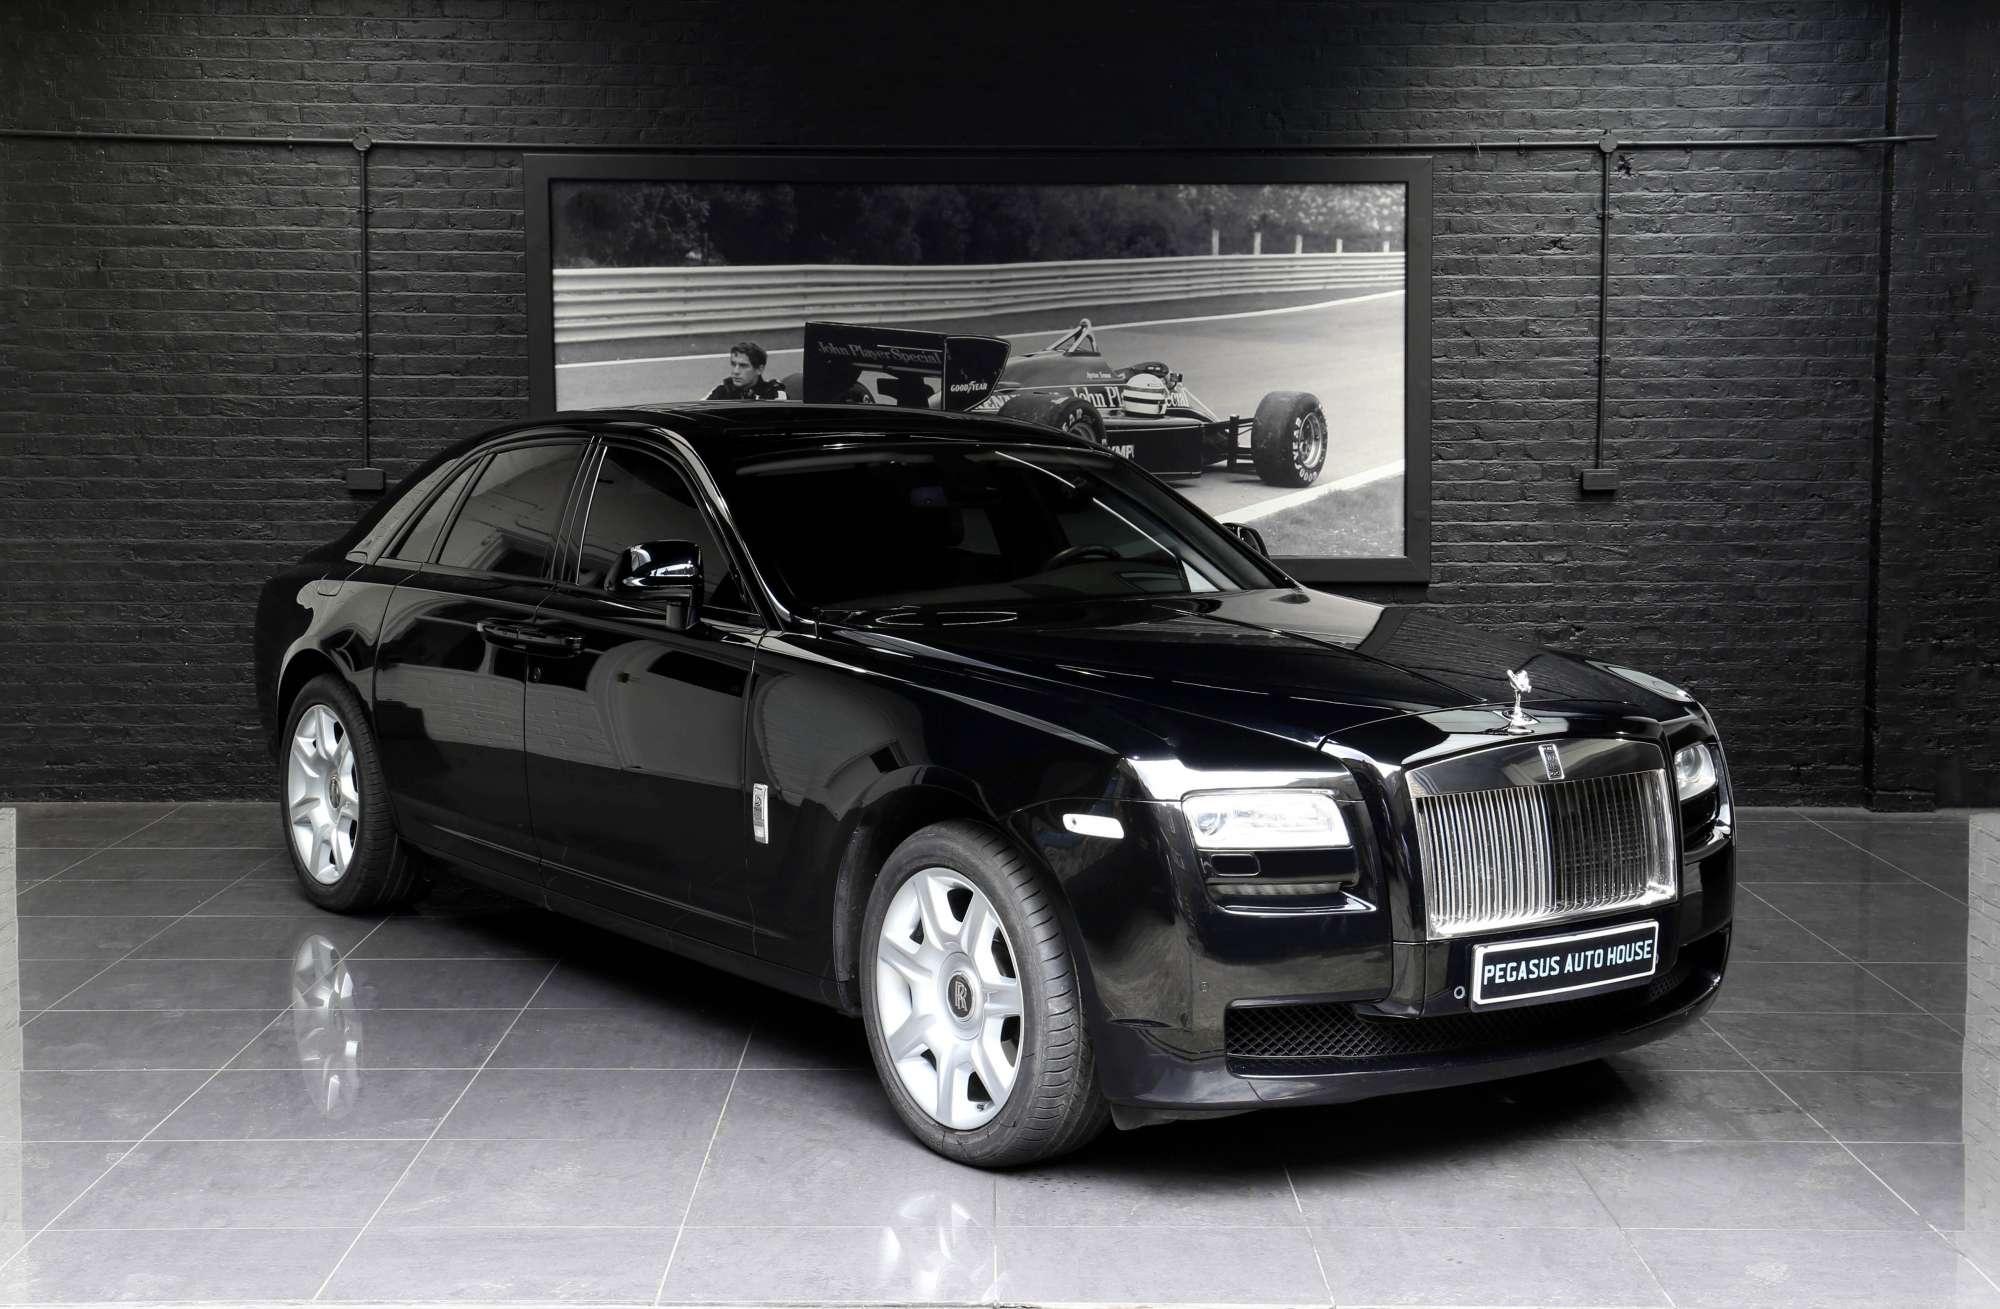 Rolls Royce Ghost Pegasus Auto House